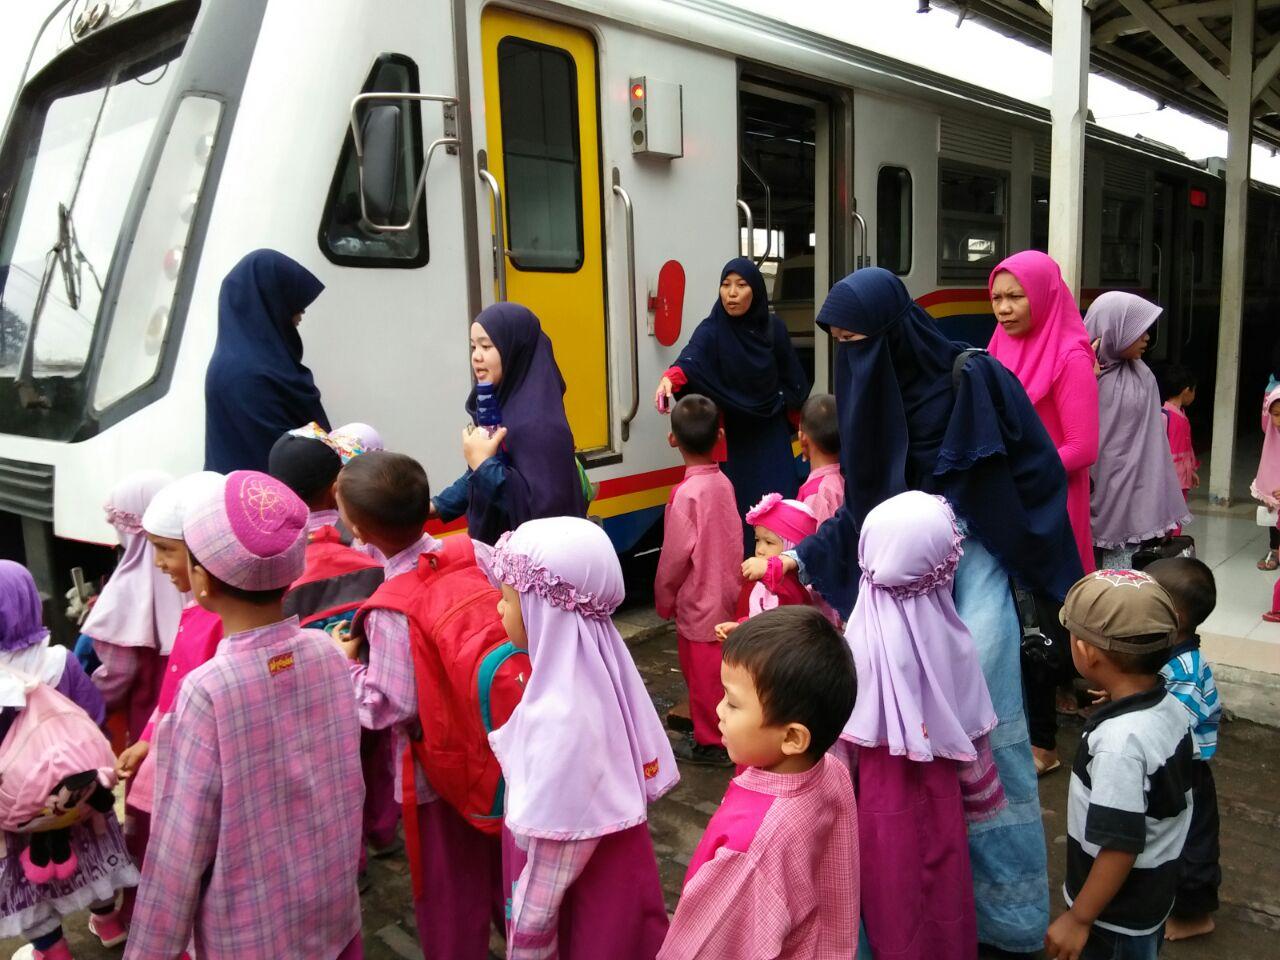 Dalam perjalanan tour edukatif ini anak ditemani oleh guru dan orangtua mereka